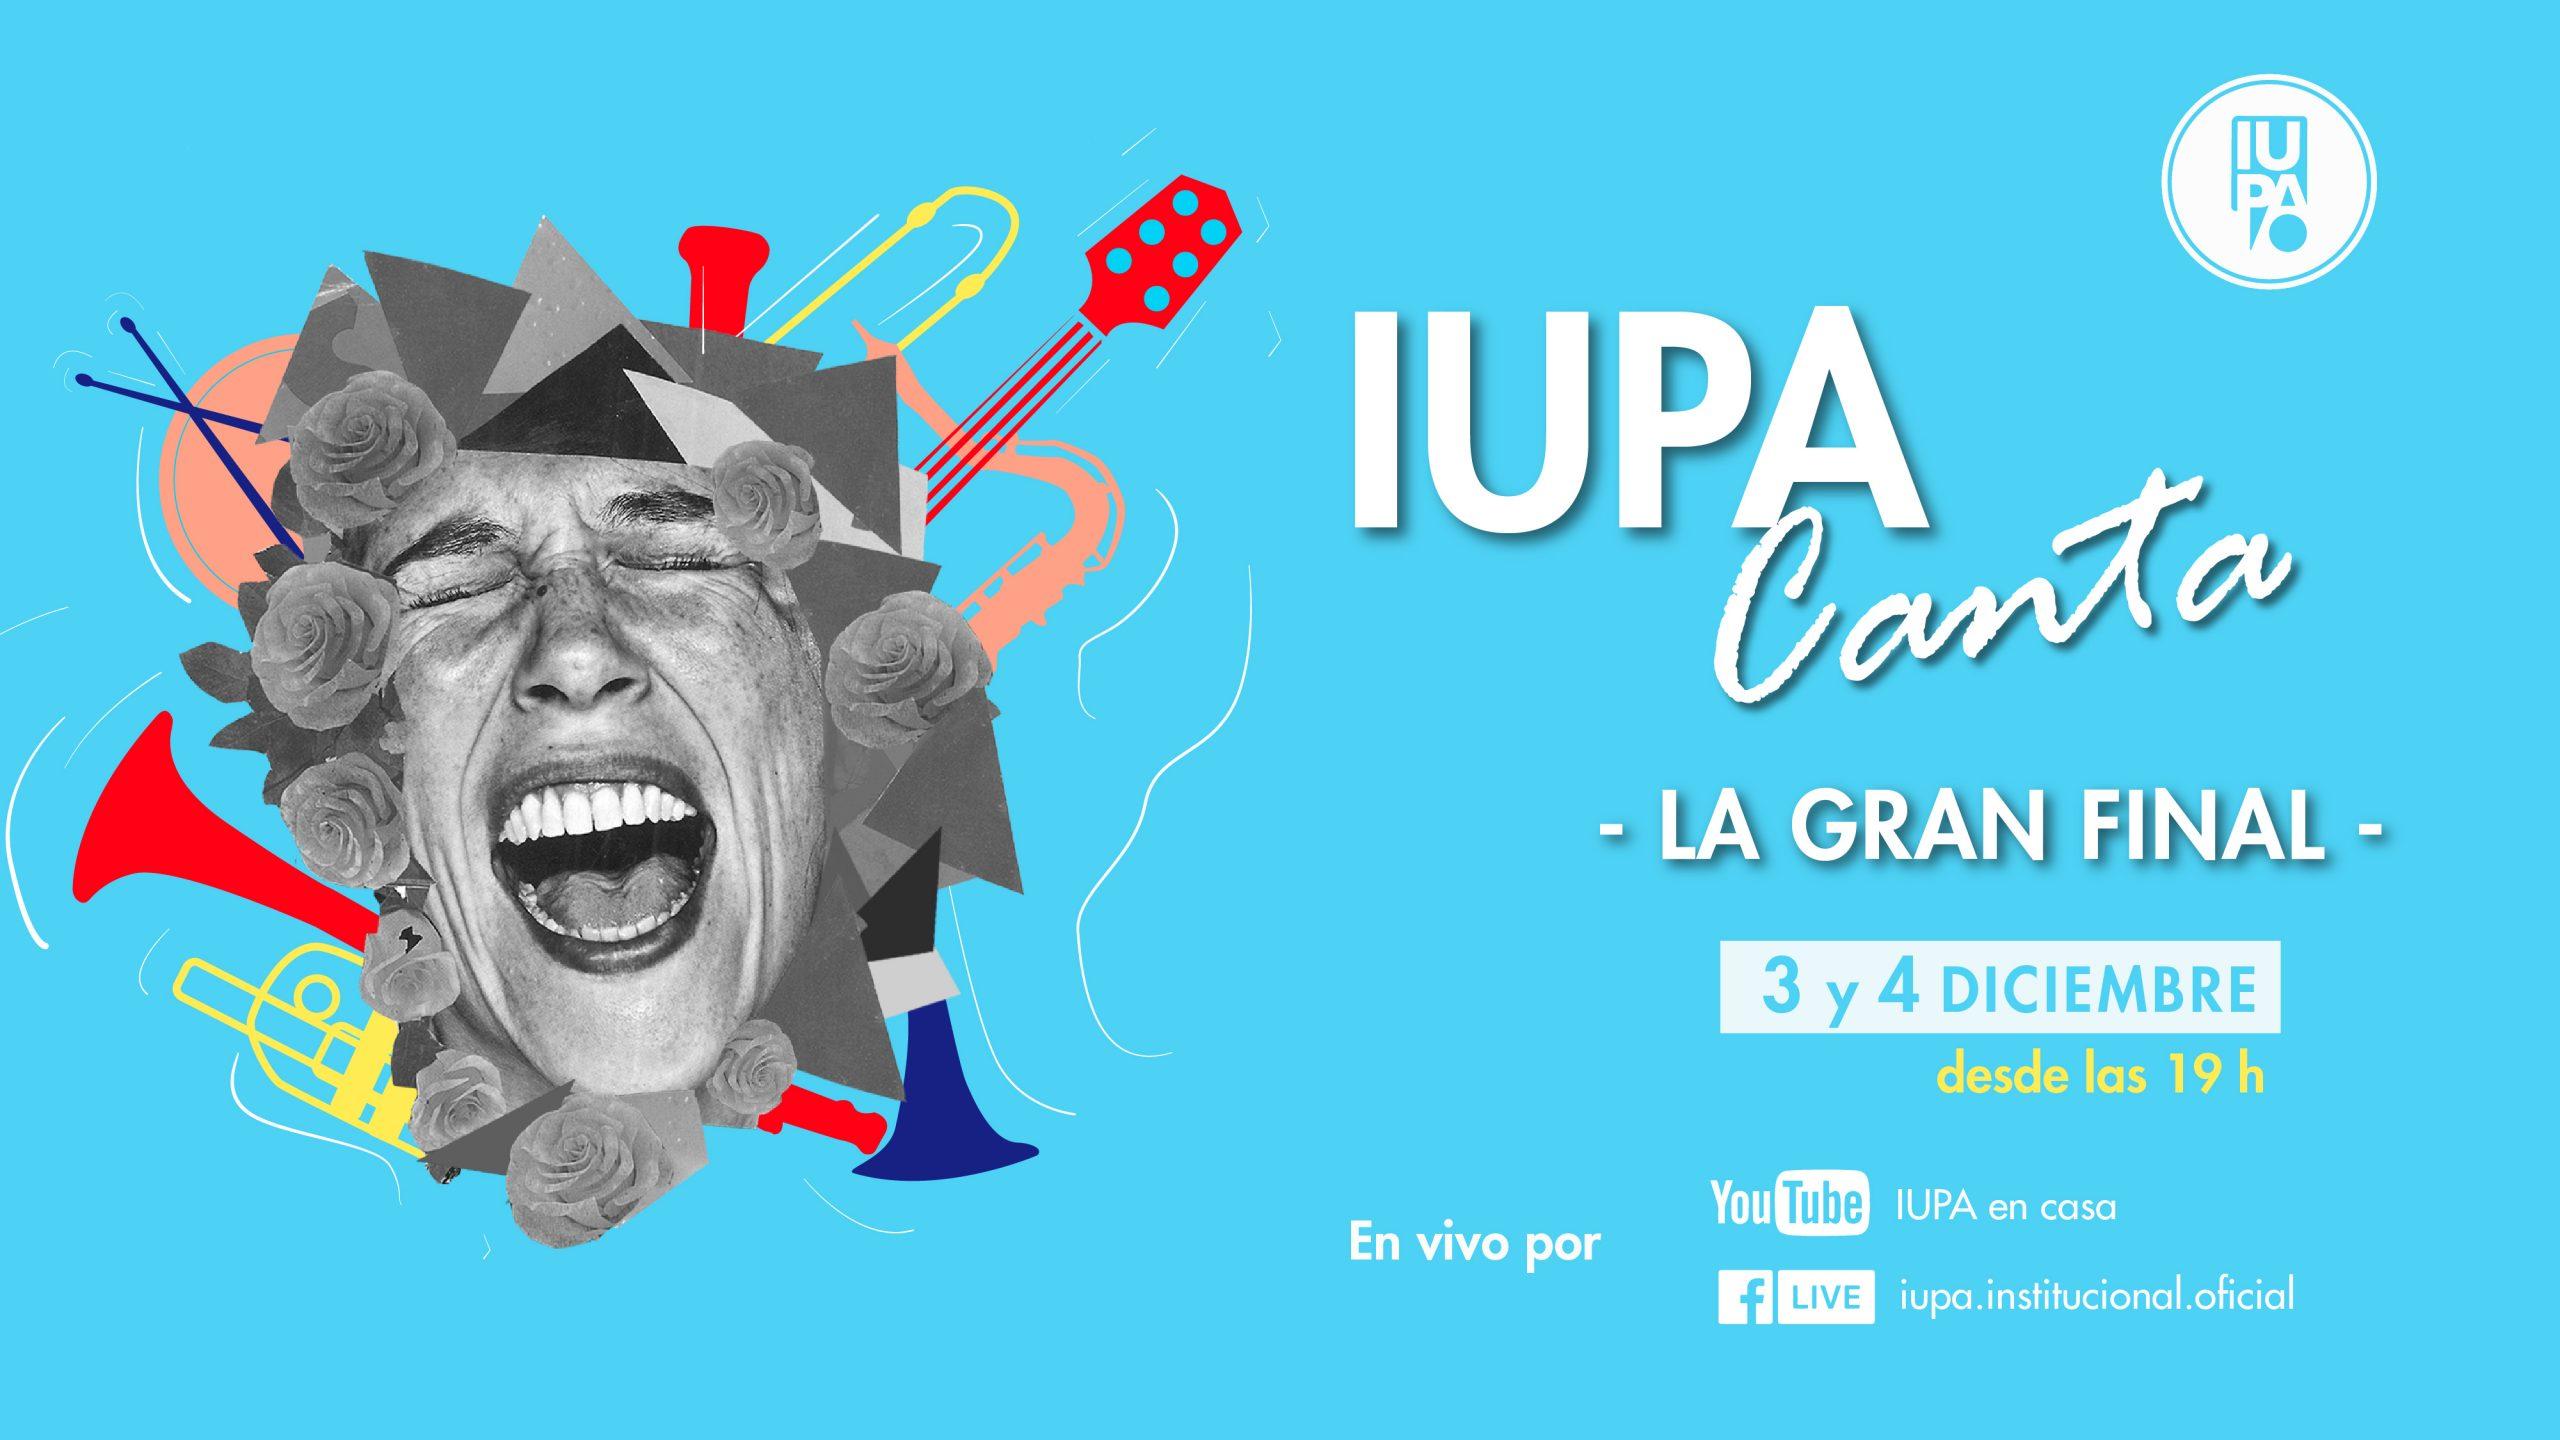 flyer gran final IUPA Canta